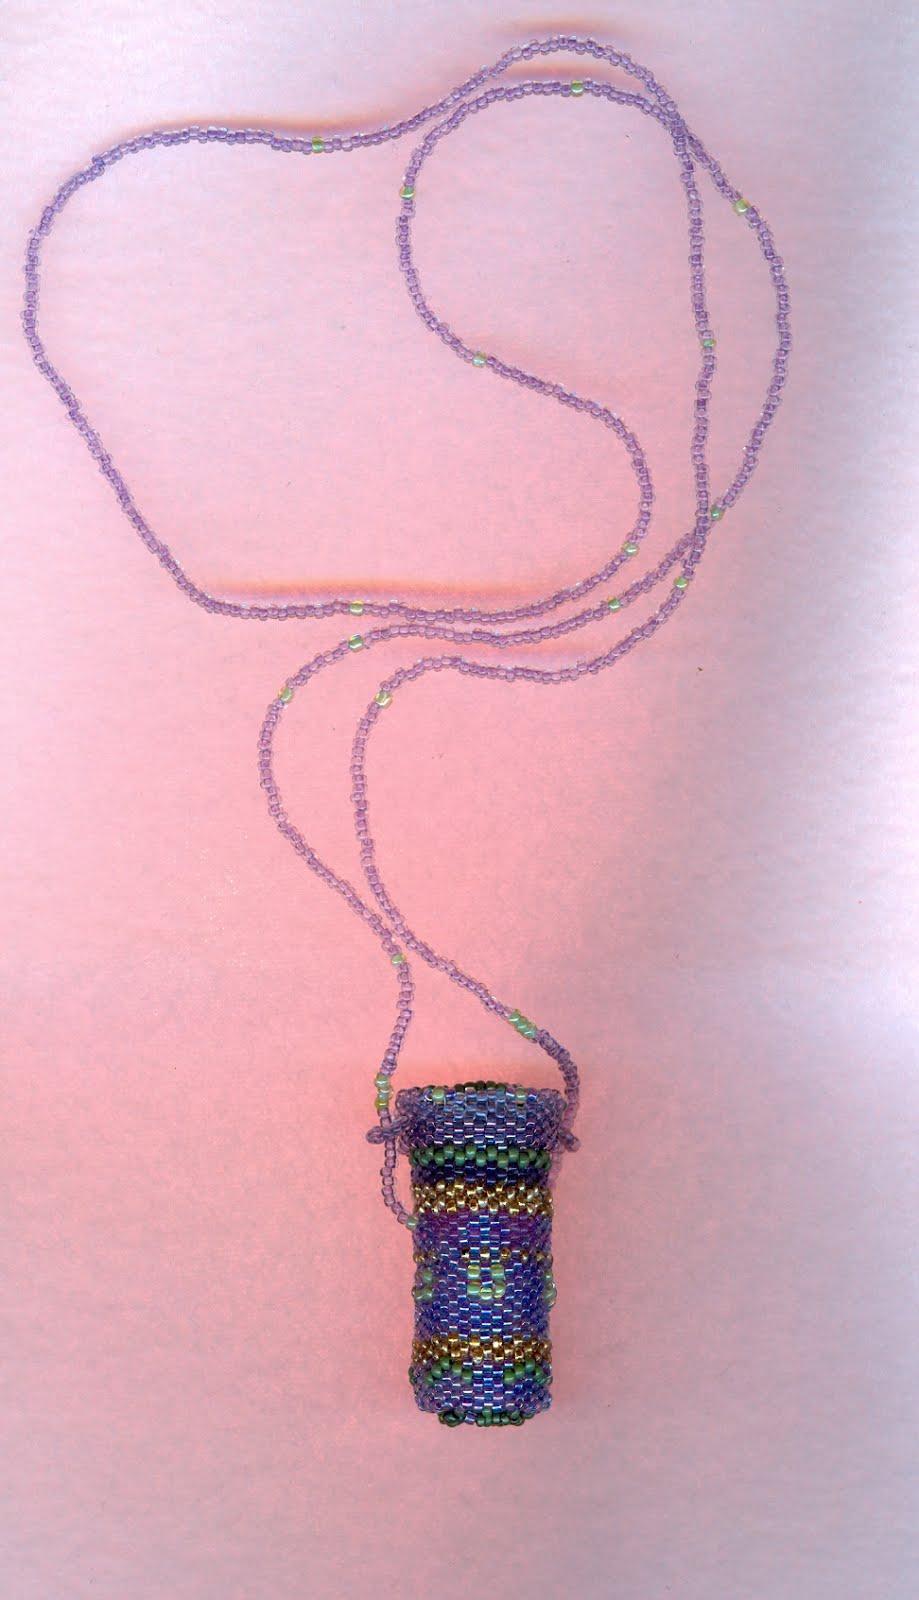 secret box with lid necklace